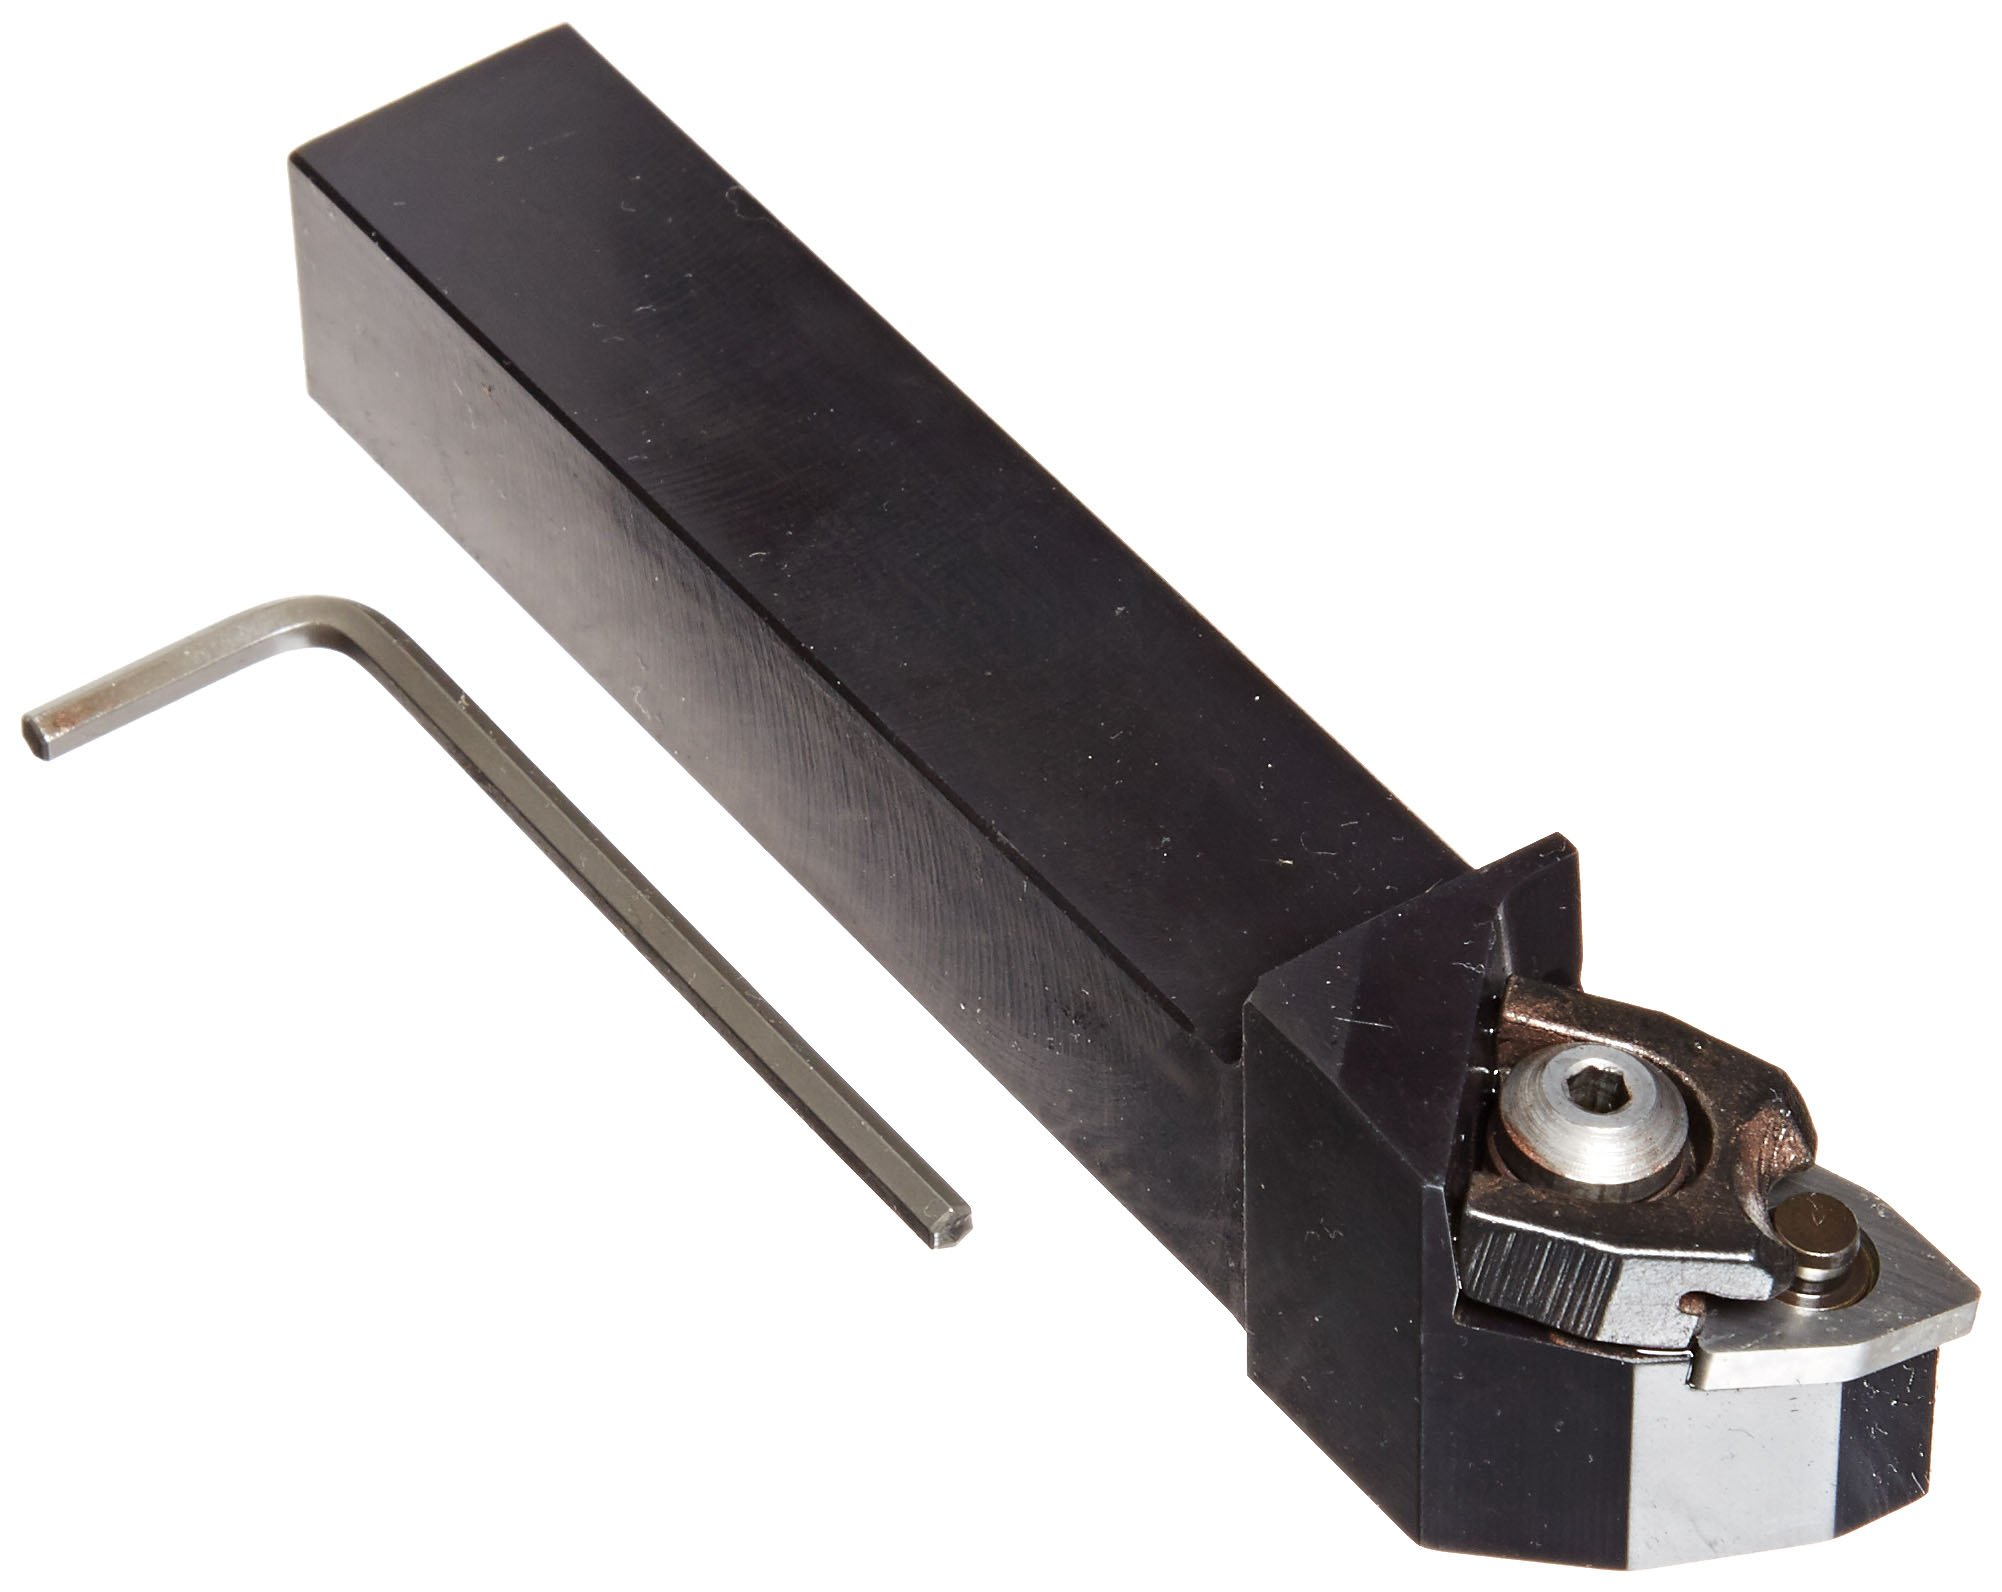 Sandvik Coromant MWLNR 2020K 08 Turning Insert Holder, Square Shank, Steel, External, Lever Lock, Right Hand, 20mm Width x 20mm Height Shank, 125mm Length x 27mm Width, WNMG 432 Insert Size